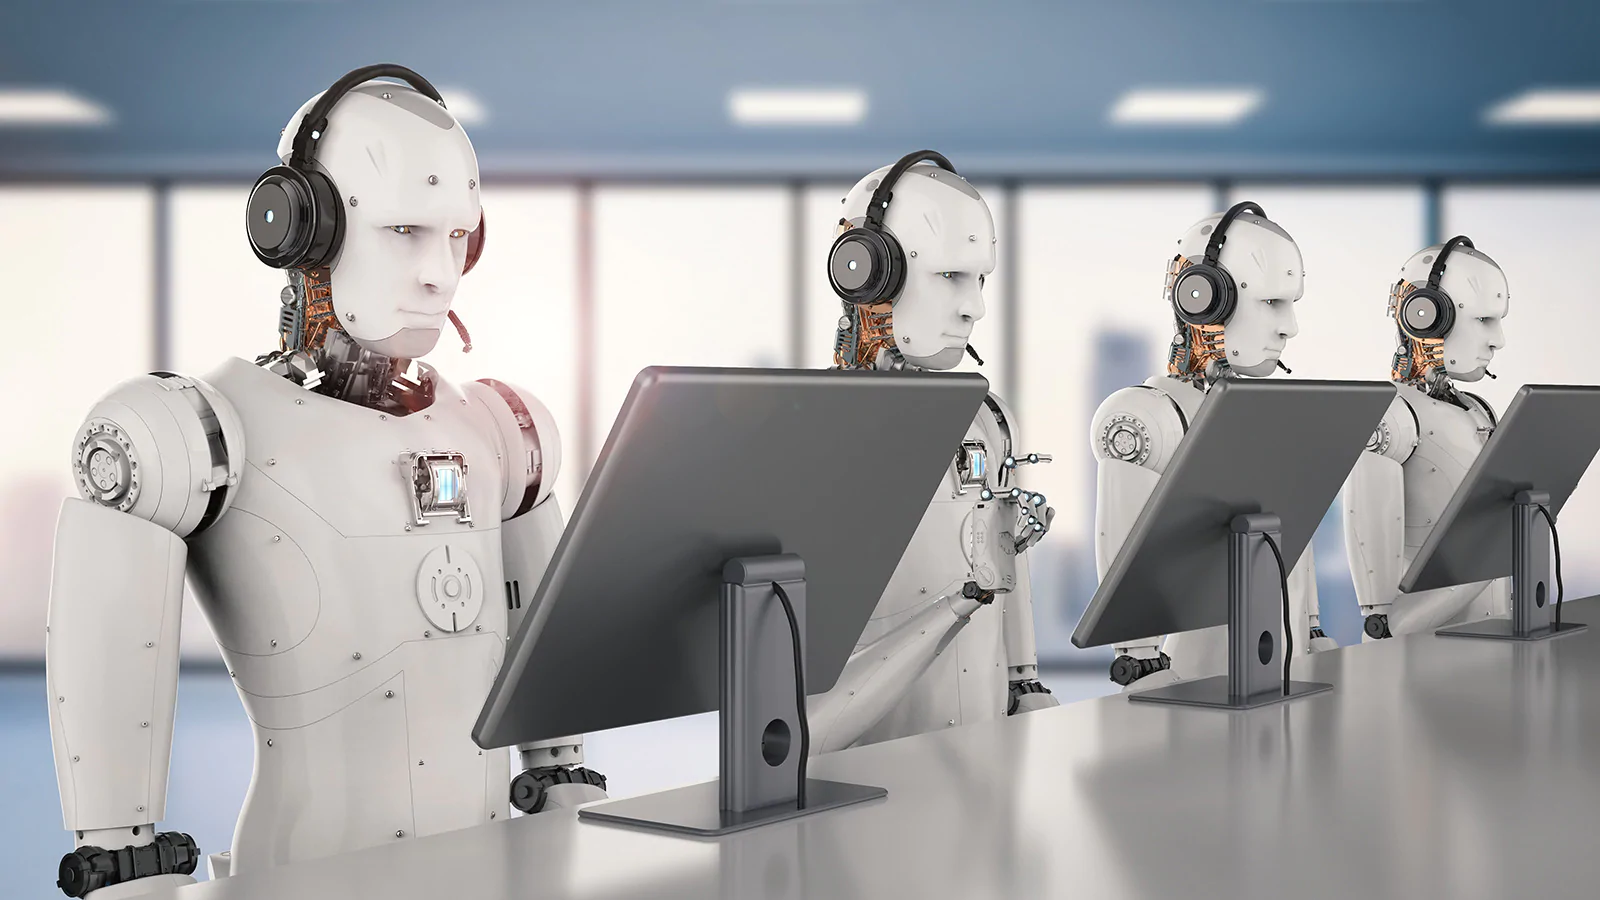 IA & appel vidéo: le tandem gagnant de la relation client